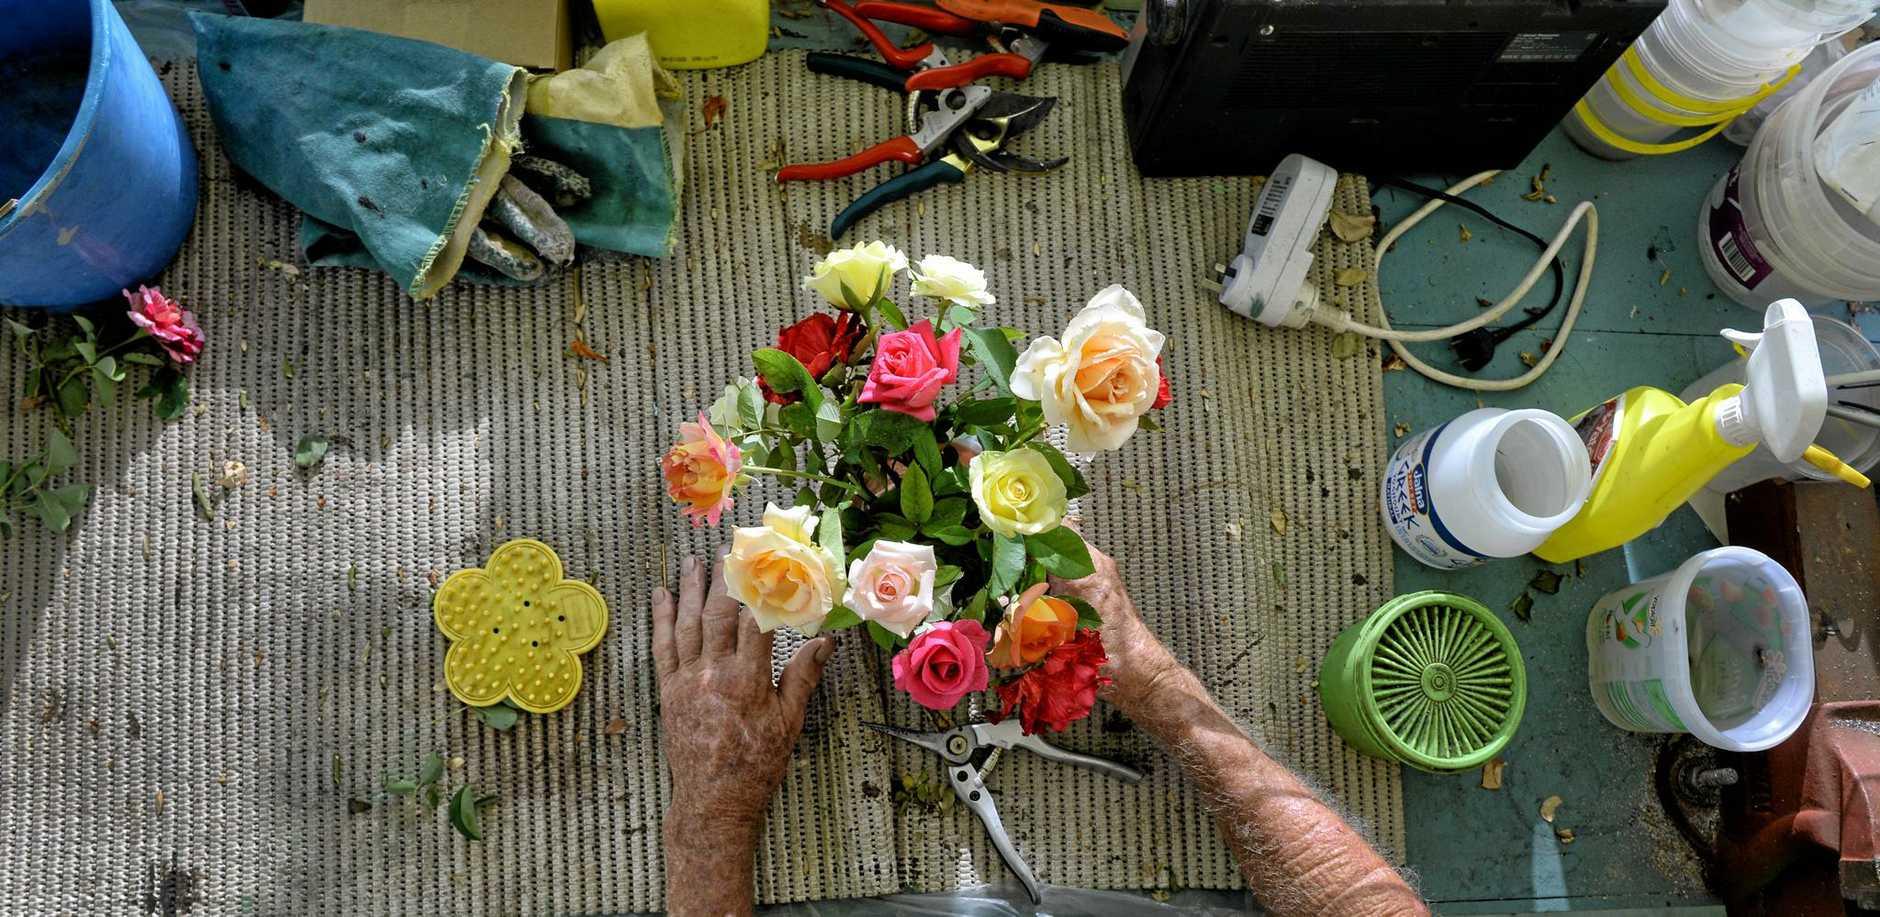 Cec Gleeson loves growing roses.